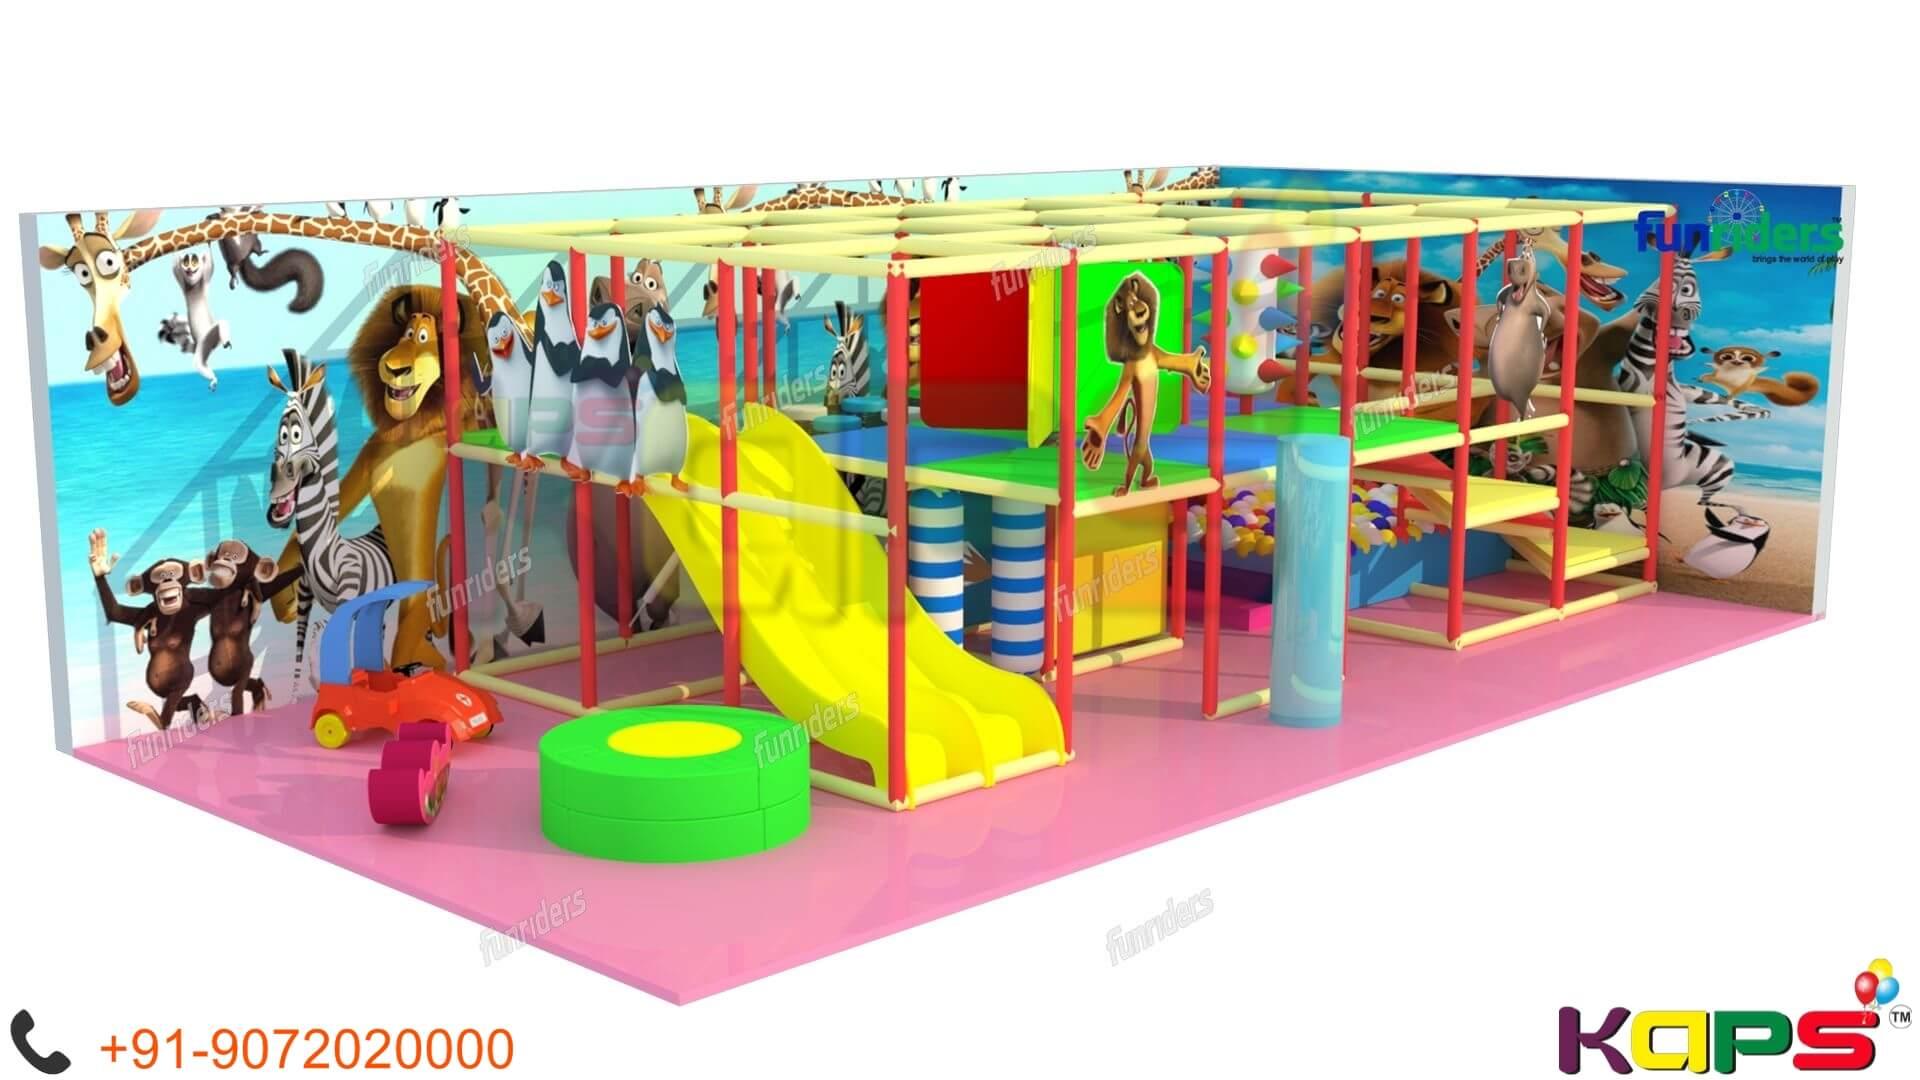 Funriders Indoor Playground Supplier